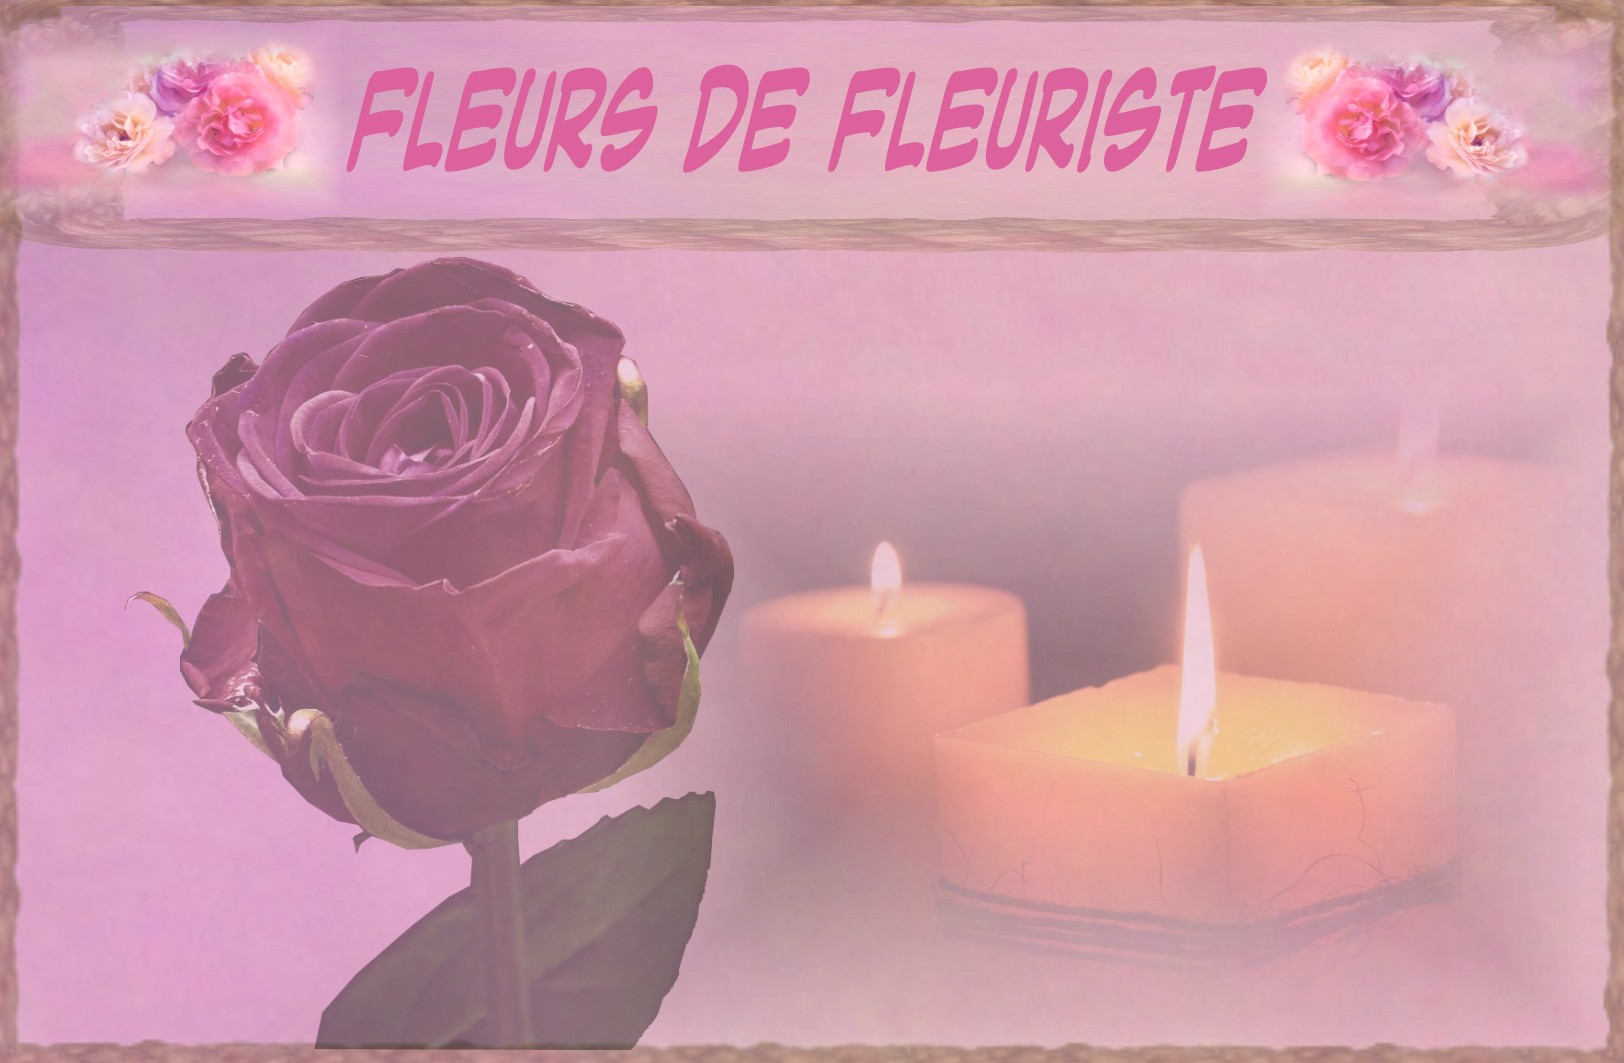 FLEURS DEUIL MERCUER 07 - FLEURS OBSÈQUES MERCUER 07 - FLEURS ENTERREMENT MERCUER 07- ✅FLEURS POUR UN ENTERREMENT A MERCUER 07 - ✅LIVRAISON FLEURS POUR OBSÈQUES MERCUER 07 - ✅FLEURS POUR CRÉMATION MERCUER 07 - ✅LIVRAISON FLEURS DEUIL MERCUER 07 - ✅LIVRAISON FLEURS OBSÈQUES MERCUER 07 - ✅LIVRAISON FLEURS ENTERREMENT MERCUER 07 - ✅LIVRAISON FLEURS DEUIL A L'EGLISE DE MERCUER 07 - ✅ENVOYER FLEURS POUR UN DEUIL A MERCUER 07 - ✅COMMENT FAIRE LIVRER DES FLEURS DEUIL A MERCUER 07 - ✅ ENVOI FLEURS ENTERREMENT MERCUER 07 - ✅ FAIRE LIVRER FLEURS DEUIL AU CIMETIÈRE MERCUER 07 - ✅ FLEURS DEUIL EGLISE MERCUER 07 - ✅ ENVOI FLEURS CIMETIÈRE A MERCUER 07 - ✅LIVRAISON DE FLEURS POUR UN DEUIL A MERCUER 07 - ✅ENVOI FLEURS DEUIL MERCUER 07 - ✅ENVOI FLEURS OBSÈQUES MERCUER 07 - ✅ENVOYER FLEURS DEUIL MERCUER 07 - ✅FAIRE LIVRER FLEURS POUR UN DEUIL A MERCUER 07 - ✅FLEURS ENTERREMENT MERCUER 07.